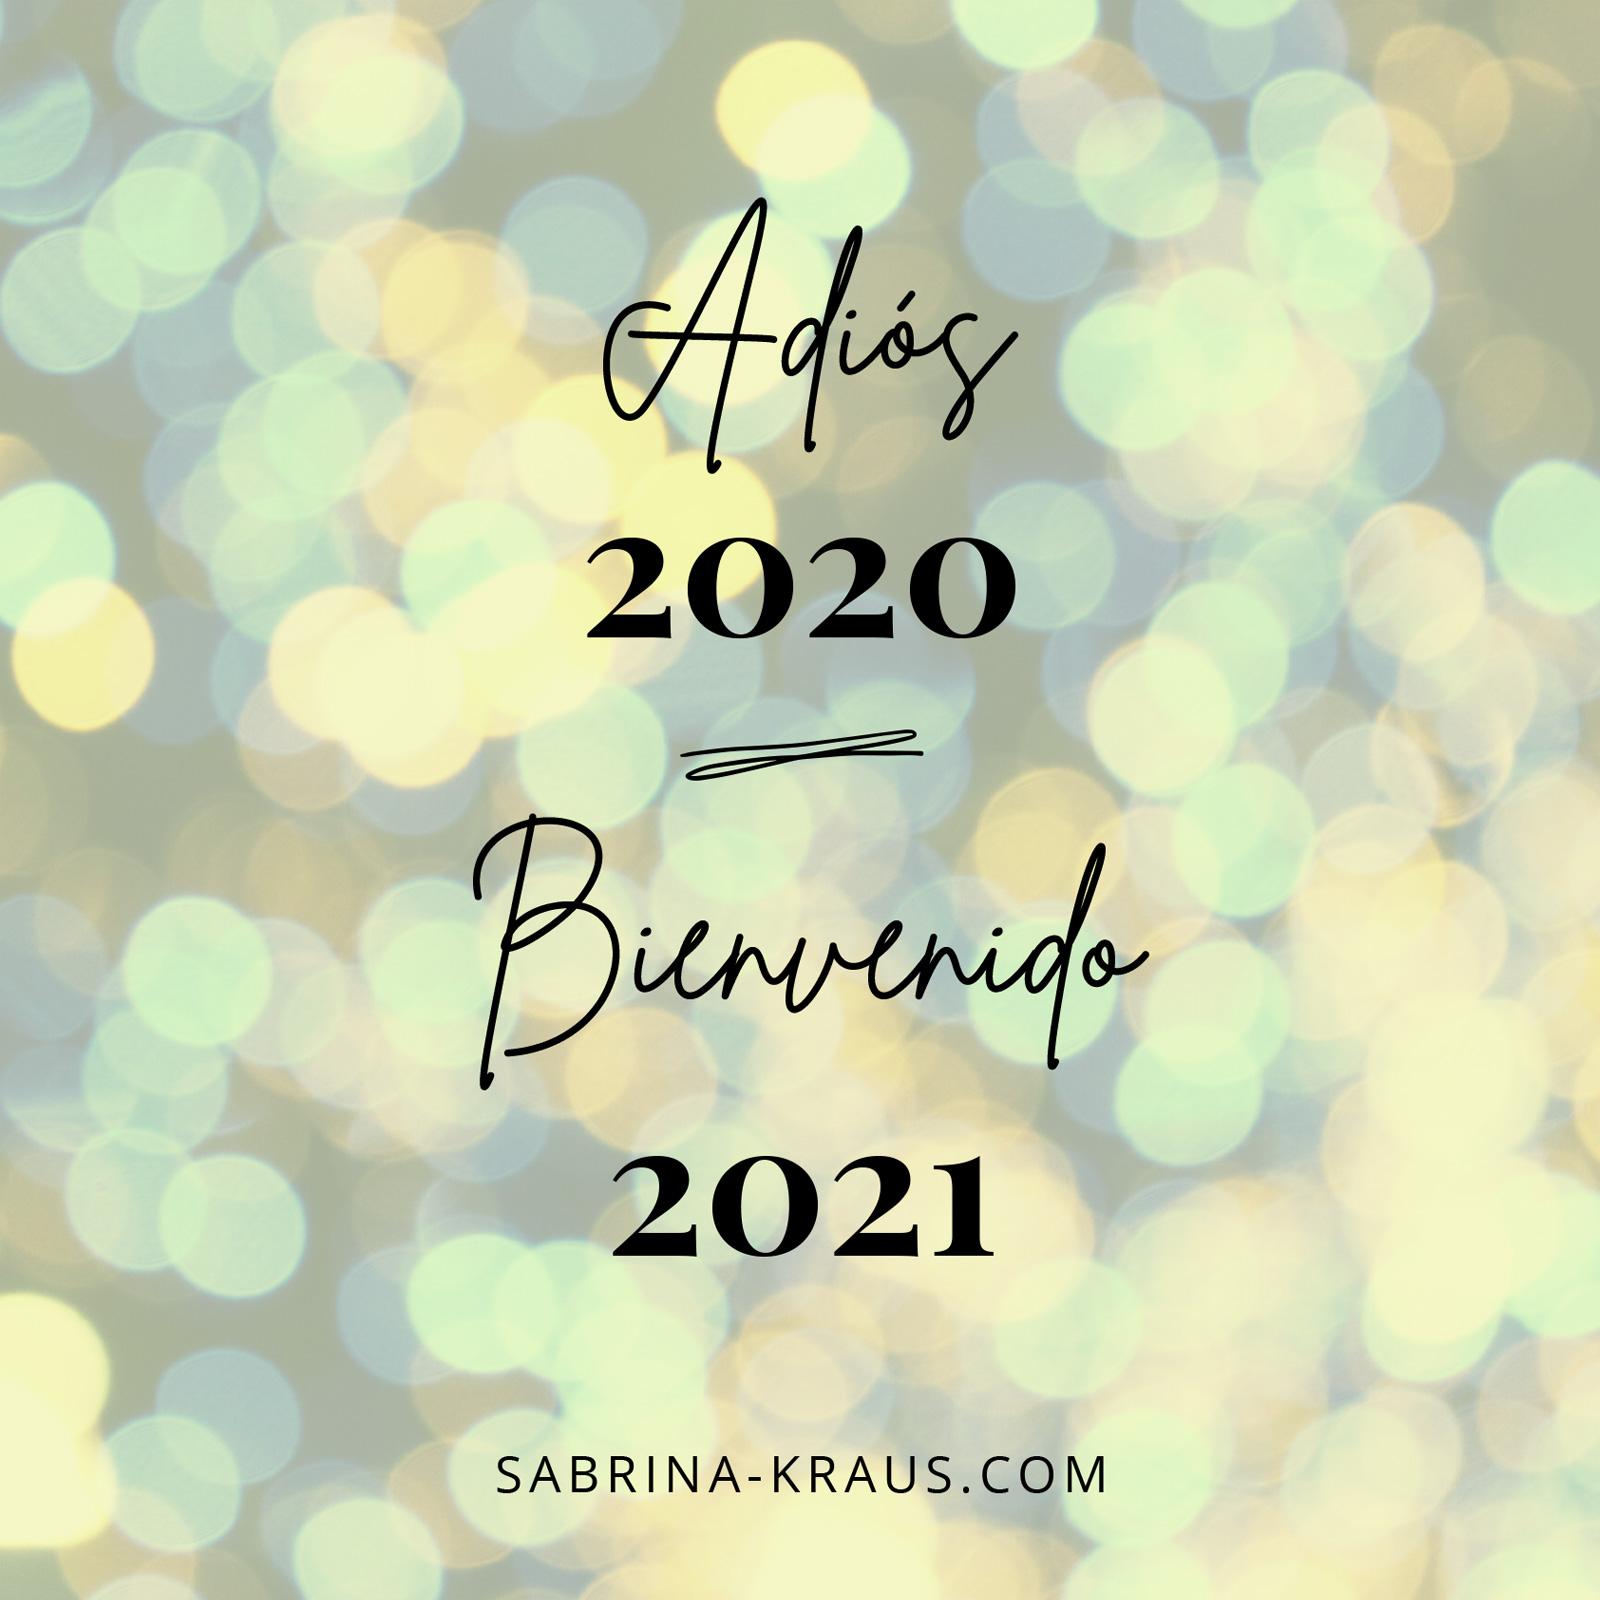 Adiós 2020 – Bienvenido 2021